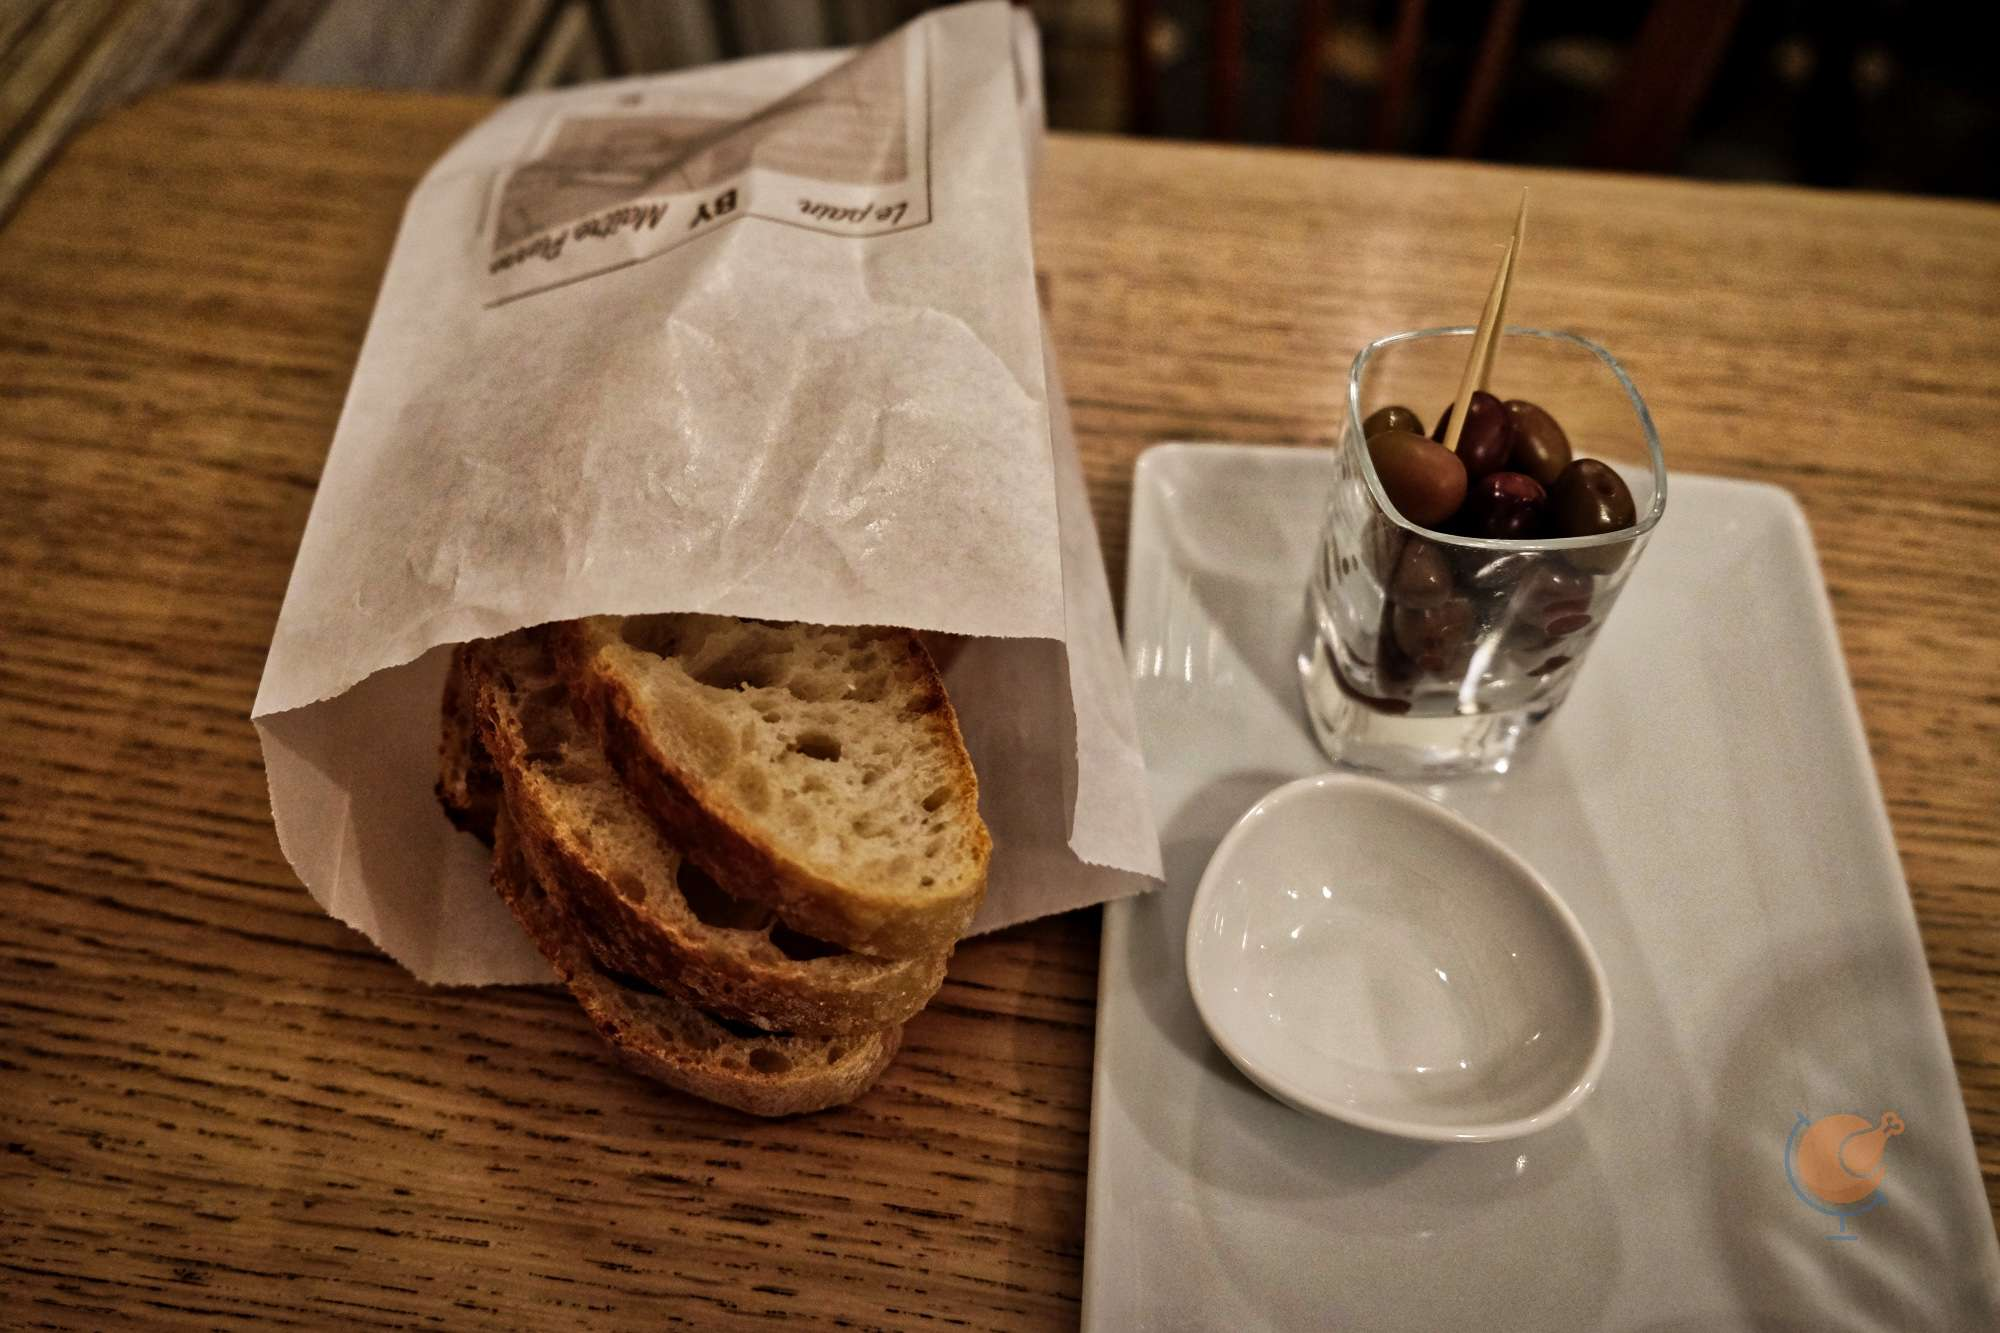 dscf1418_bar_des_oiseaux_restaurant_france_nice_nizza_vilagevo_jokuti_andras_l_w.jpg